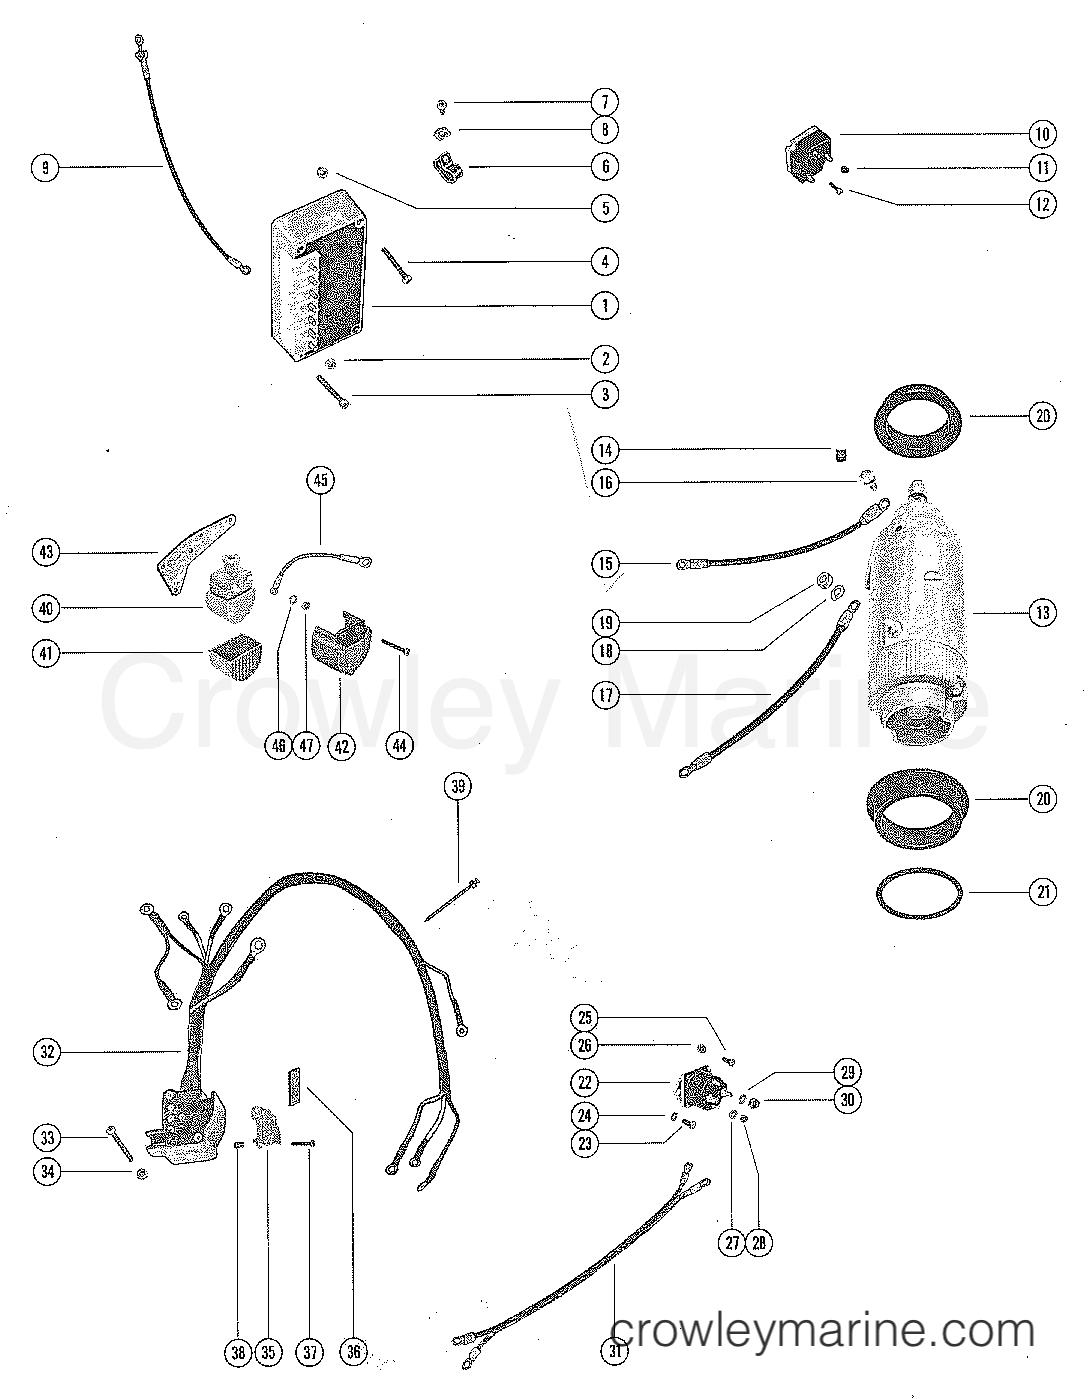 Starter Motor Starter Solenoid Rectifier Amp Wiring